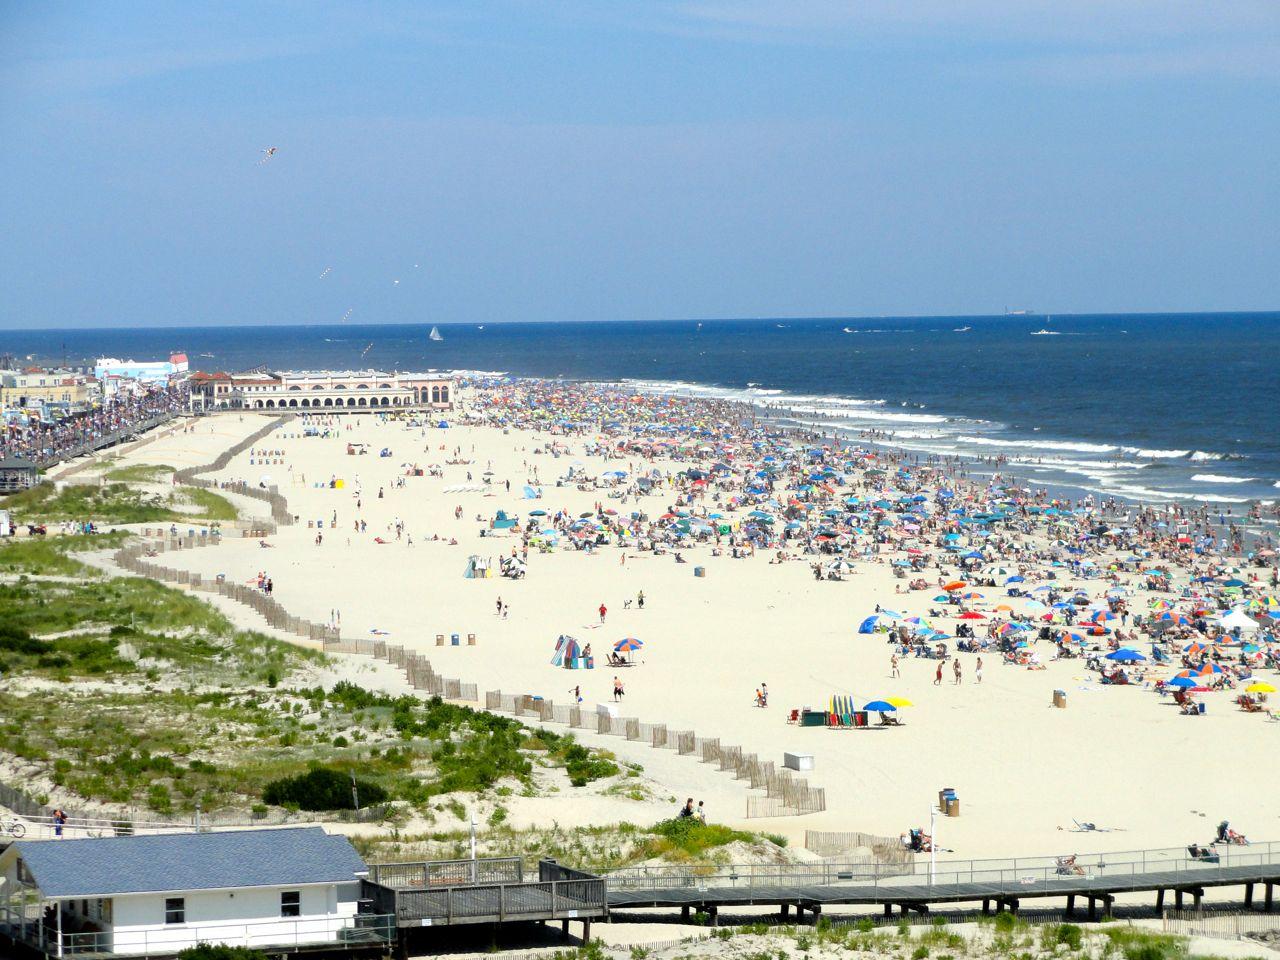 Ocean city wins big in top beaches contest ocnj daily for Ocean city nj fishing report